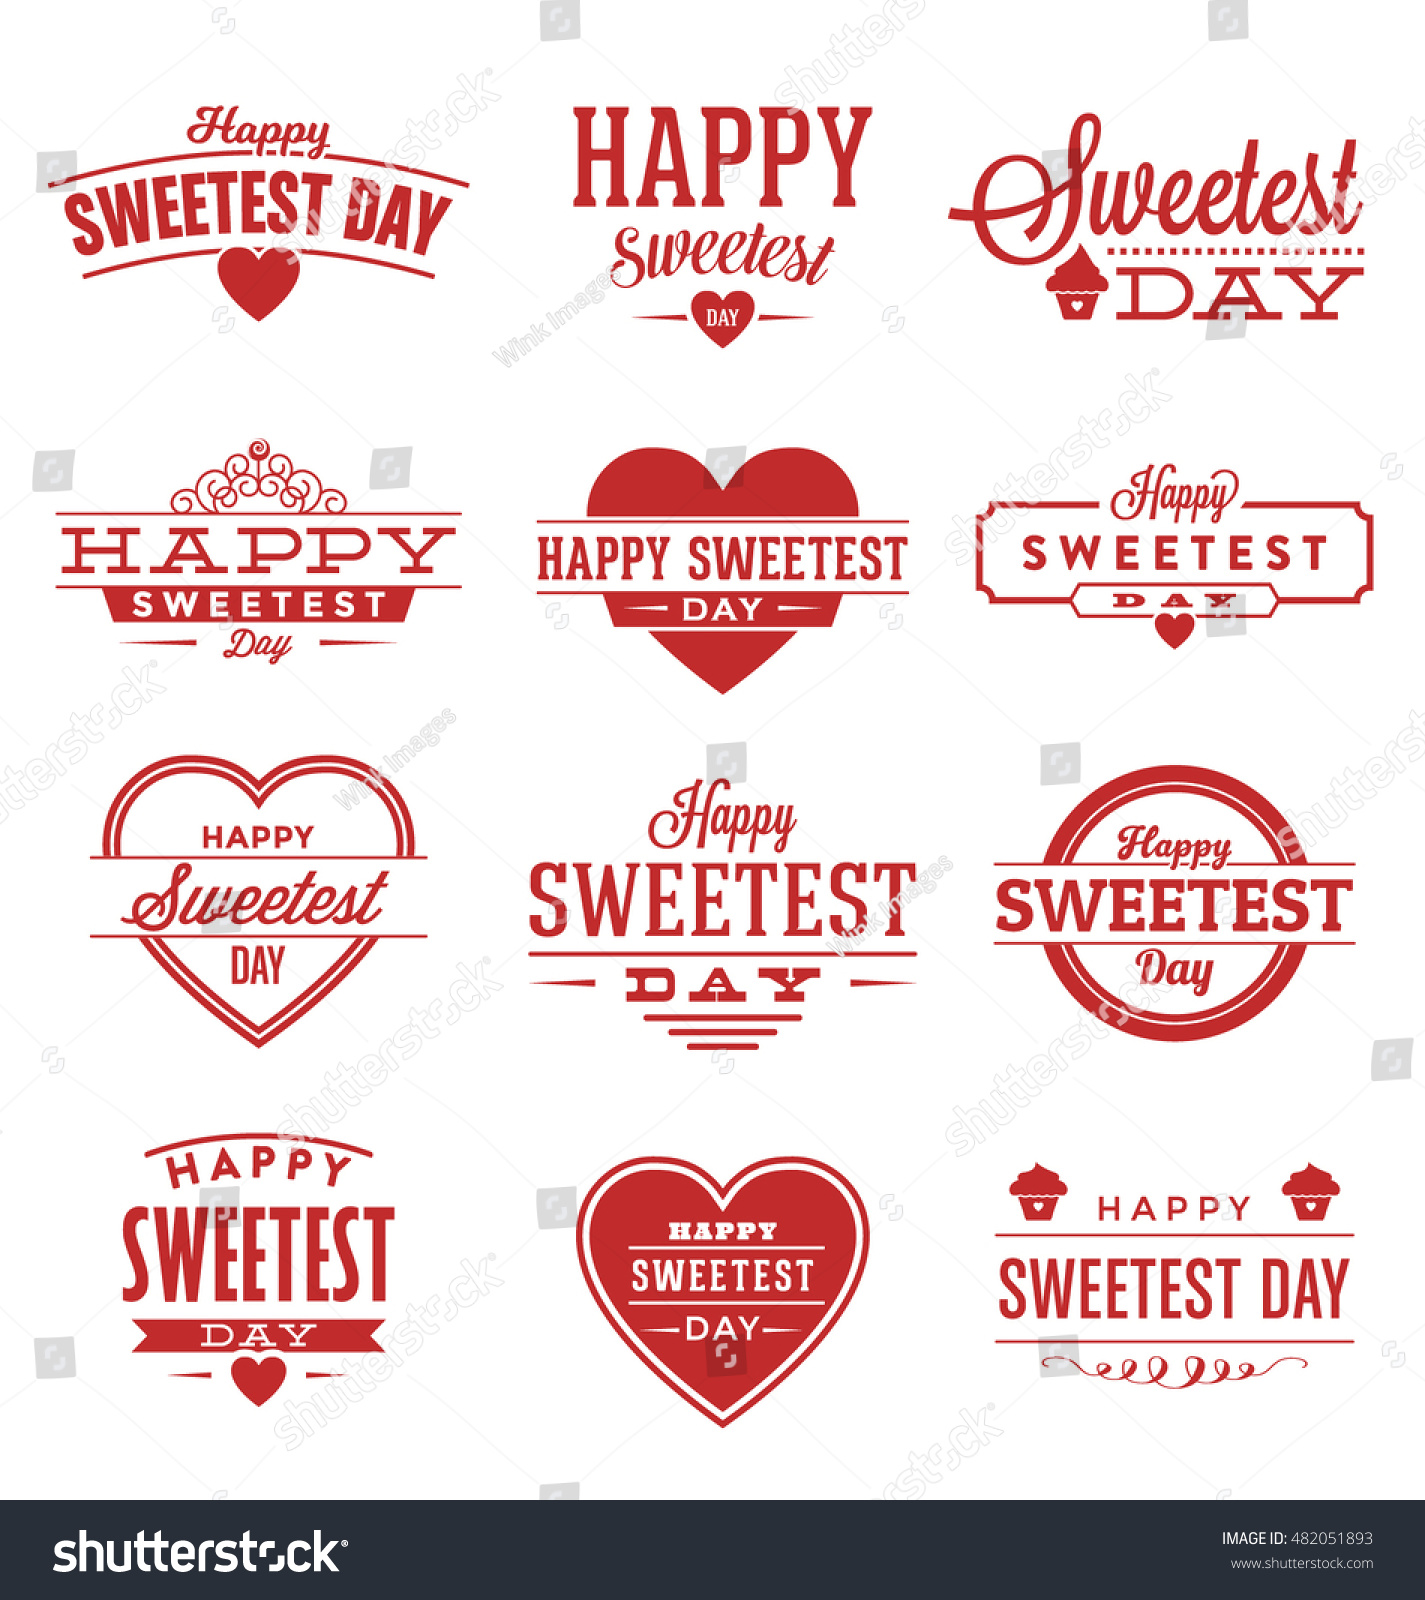 Happy Sweetest Day Typographic Vector Design Stock Vector Royalty